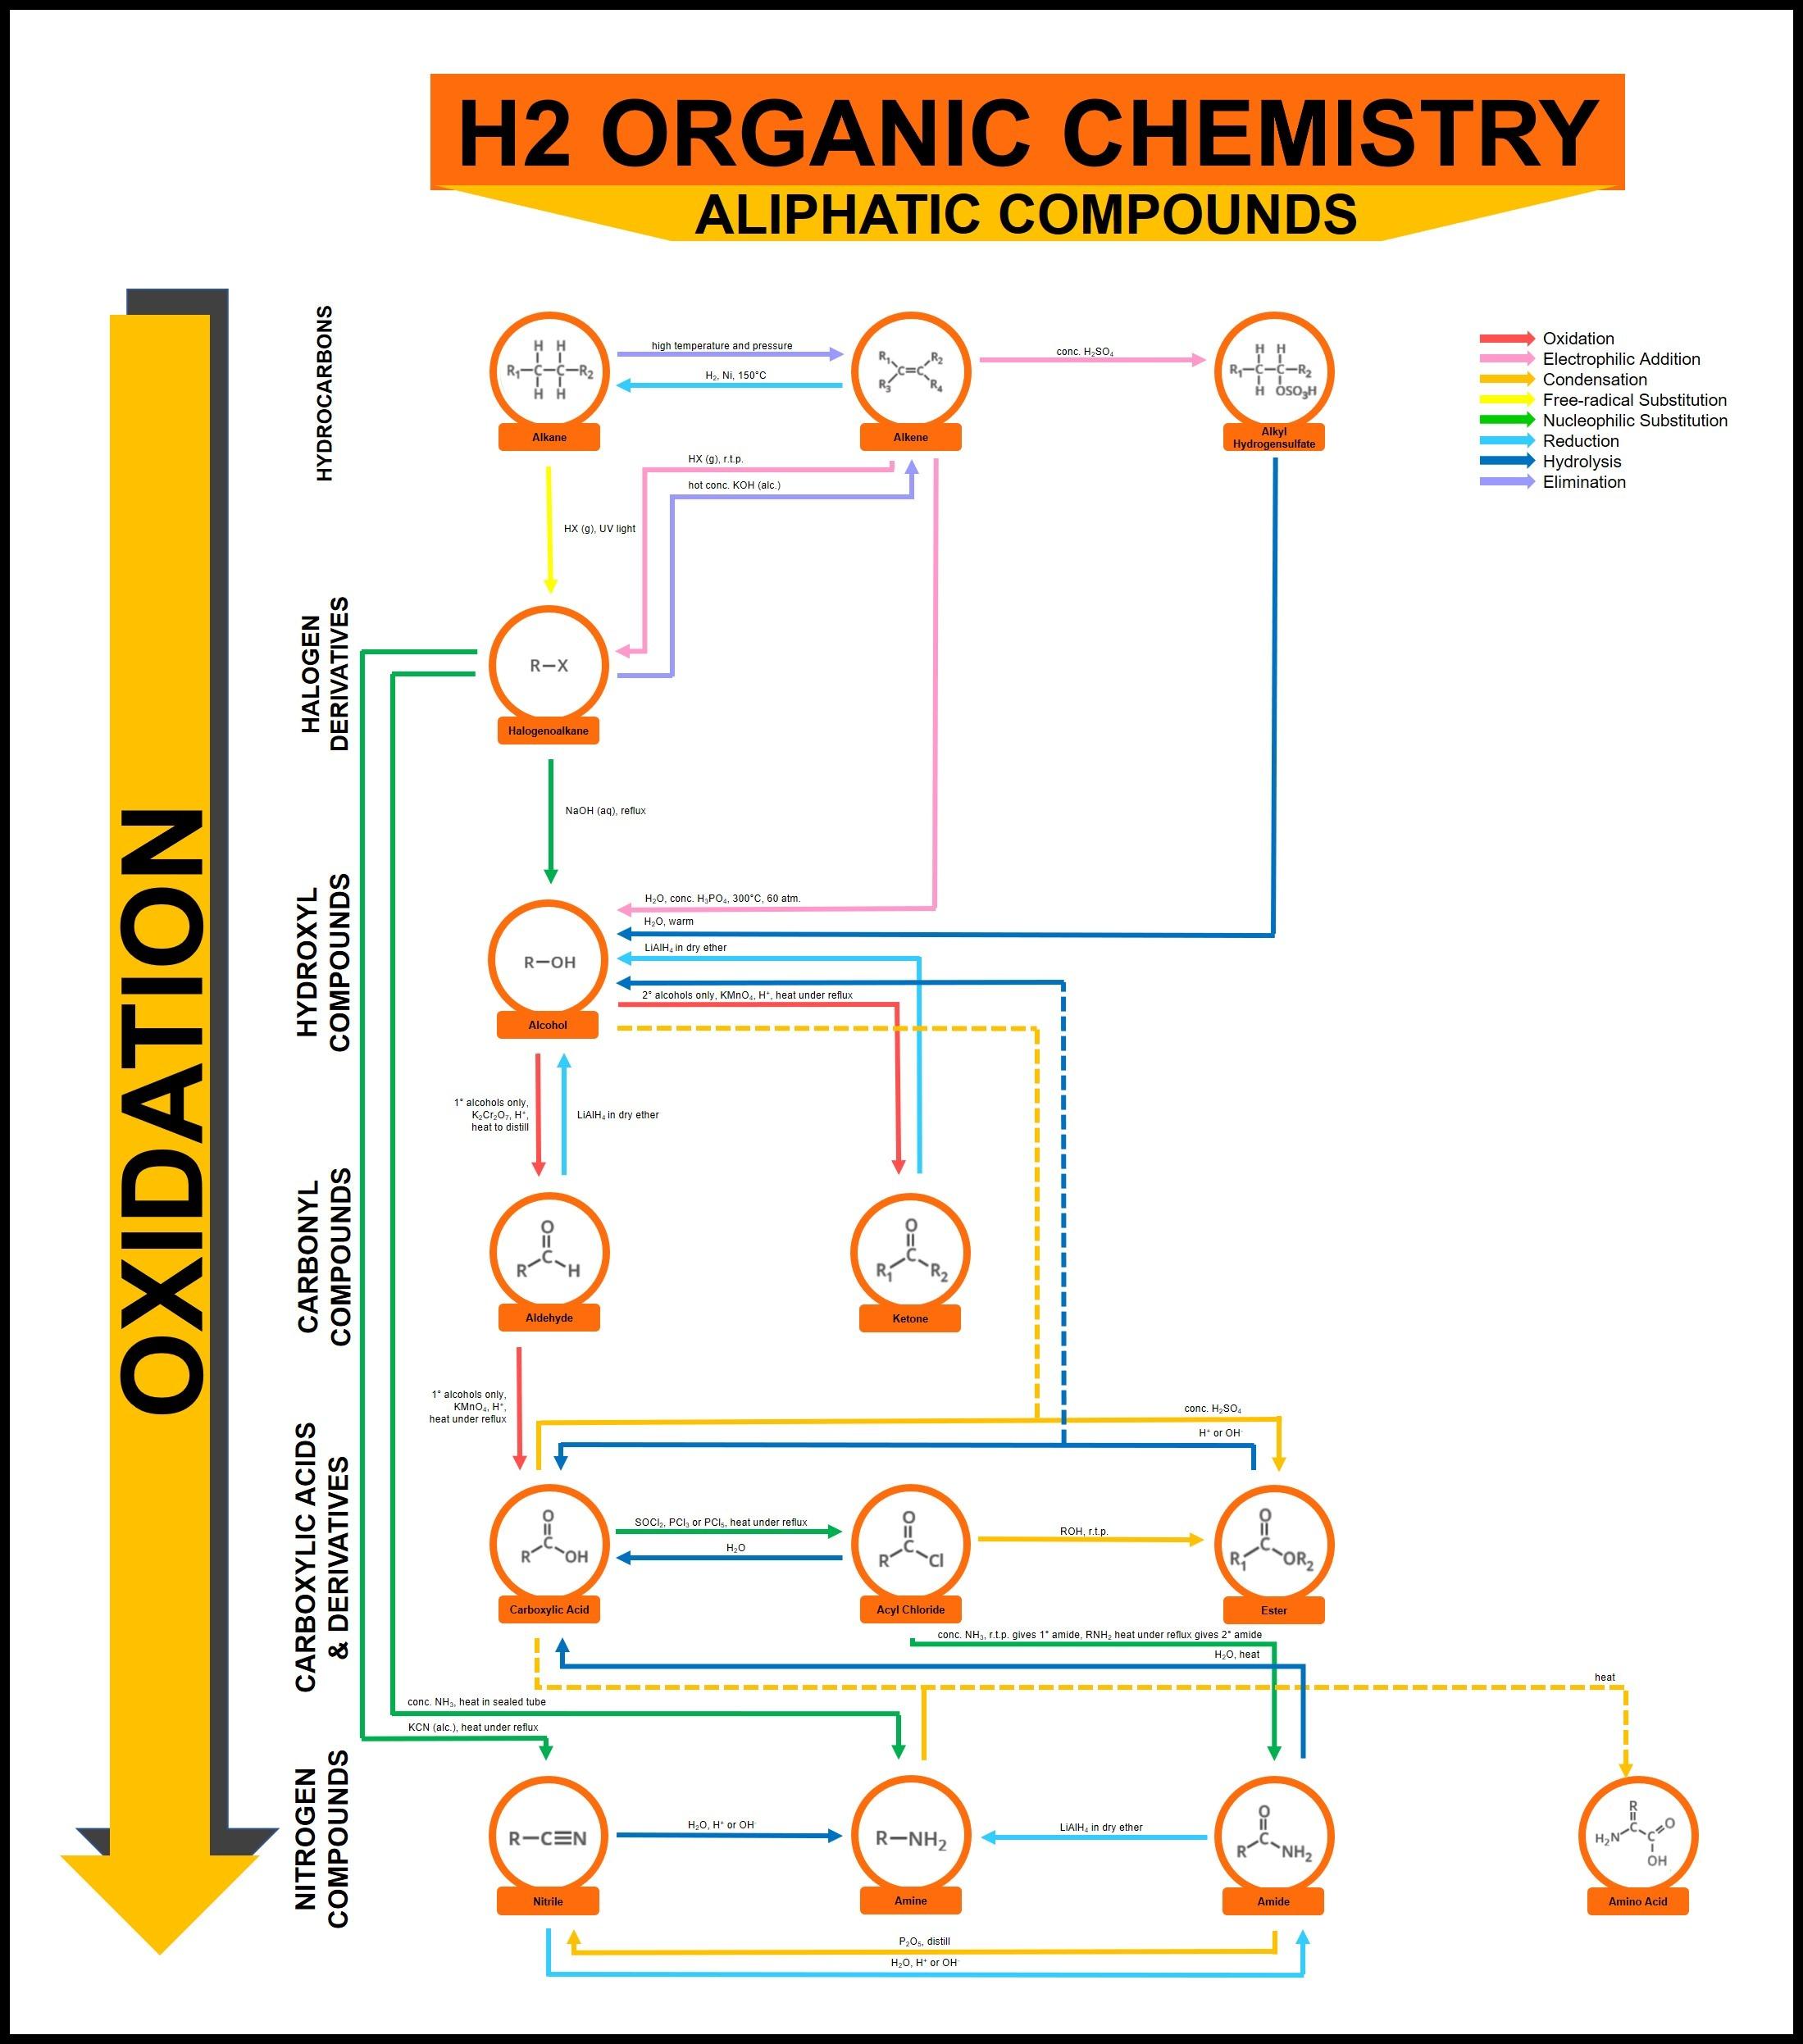 H2 Organic Chem Aliphatic Reaction Summary